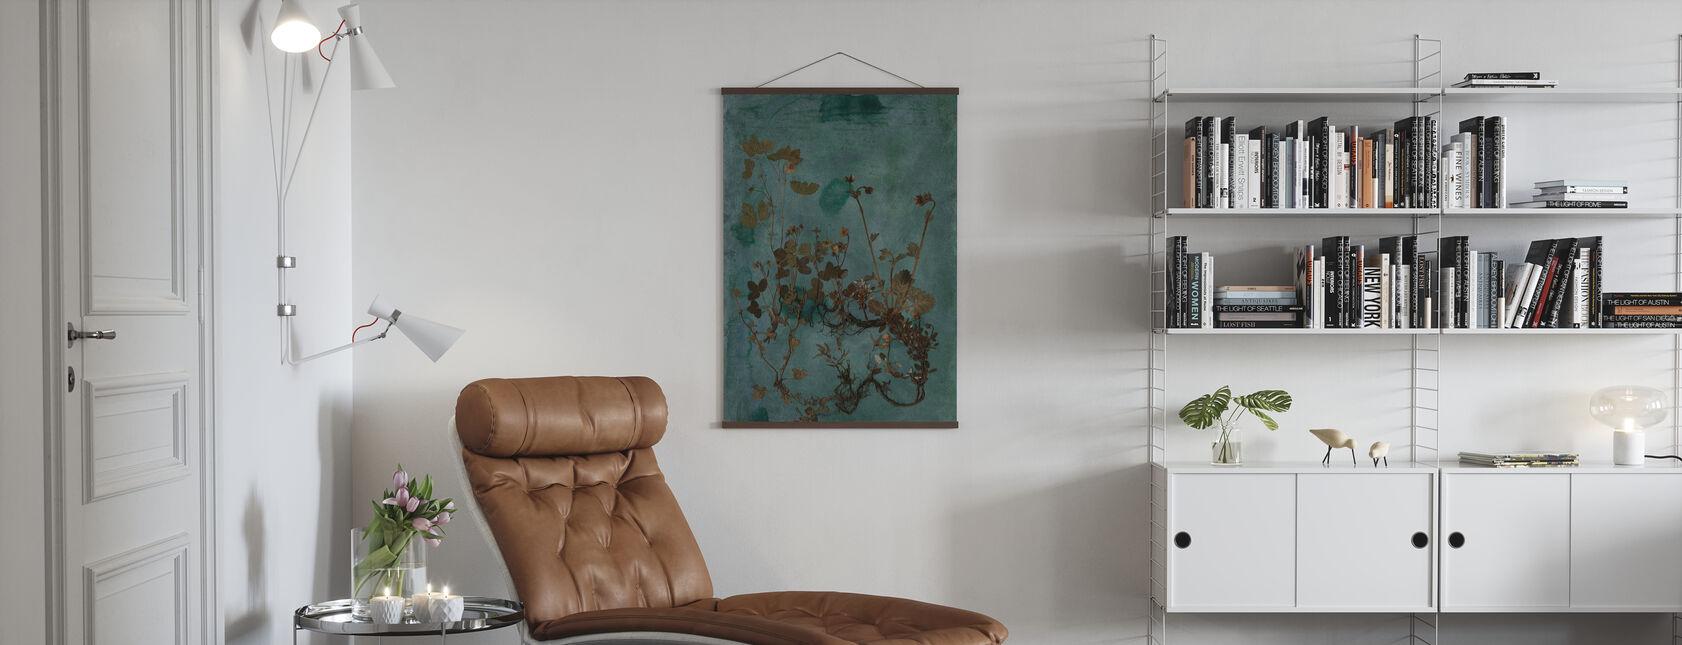 Rhizom - Poster - Wohnzimmer